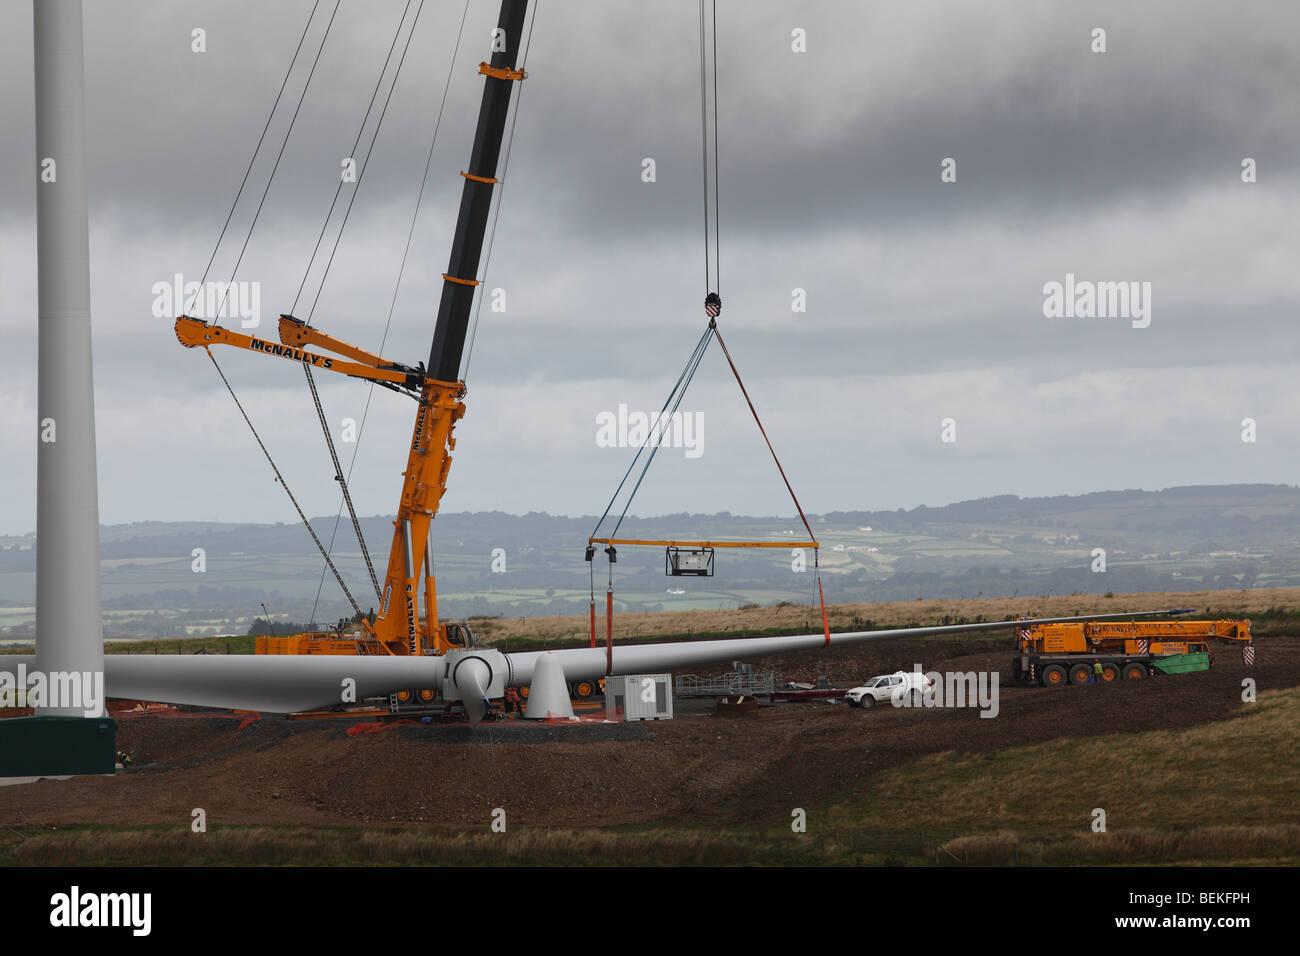 Assembling a wind turbine-fitting turbine blade to hub - Stock Image